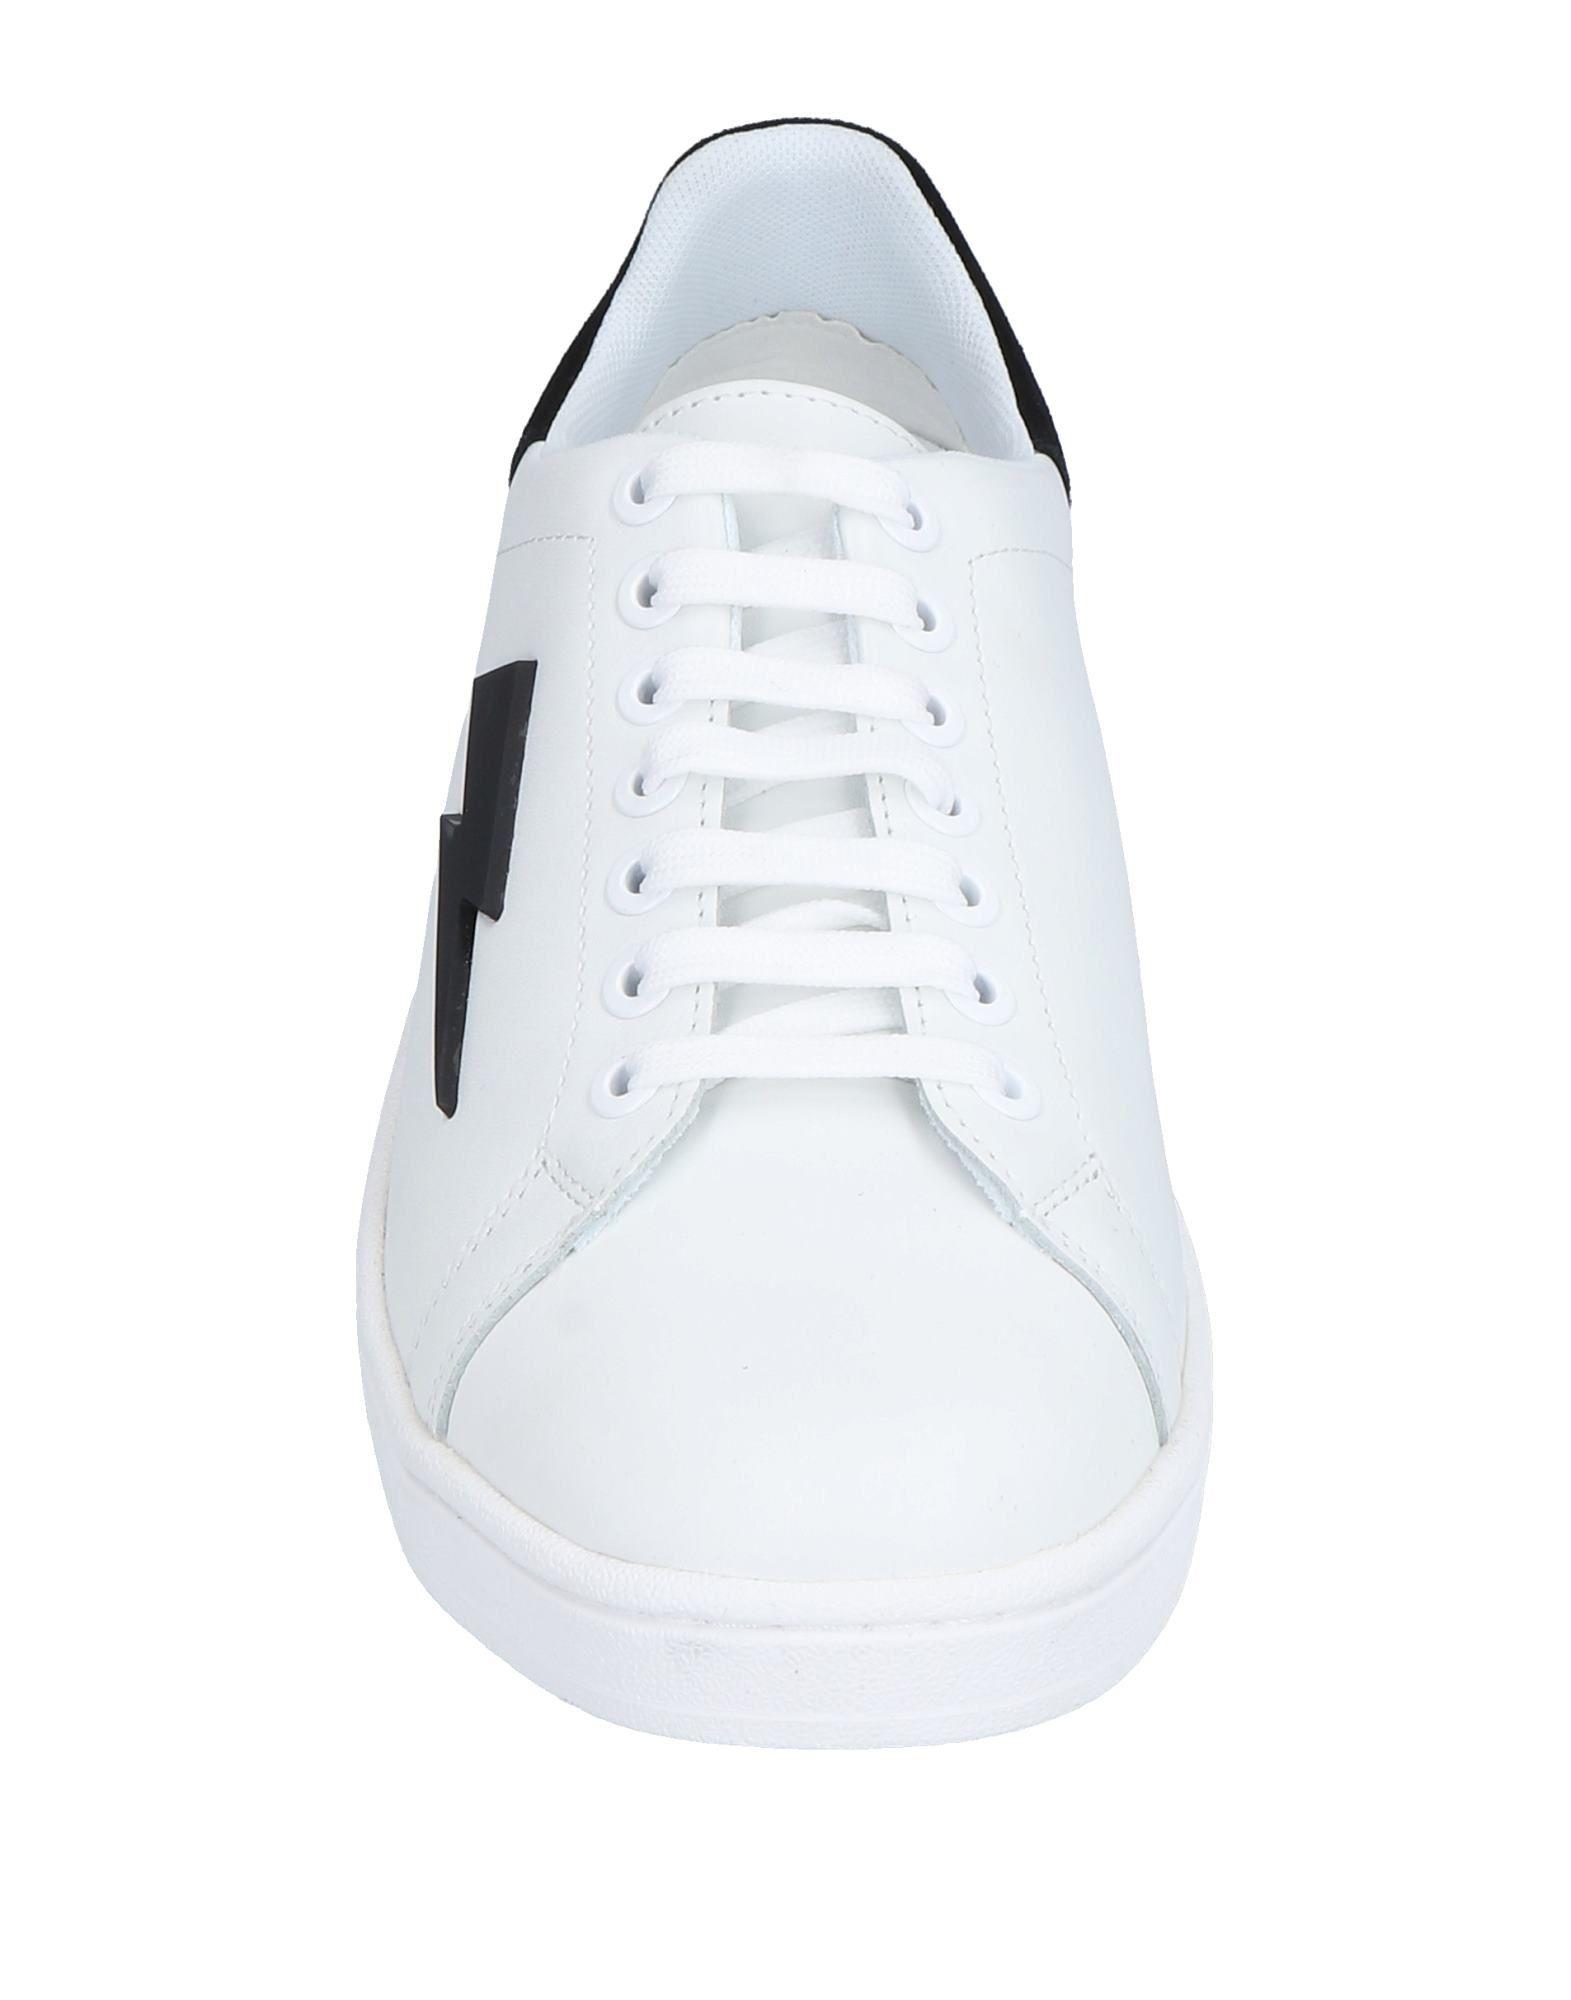 Neil Herren Barrett Sneakers Herren Neil  11522750QW Gute Qualität beliebte Schuhe b0eaaf